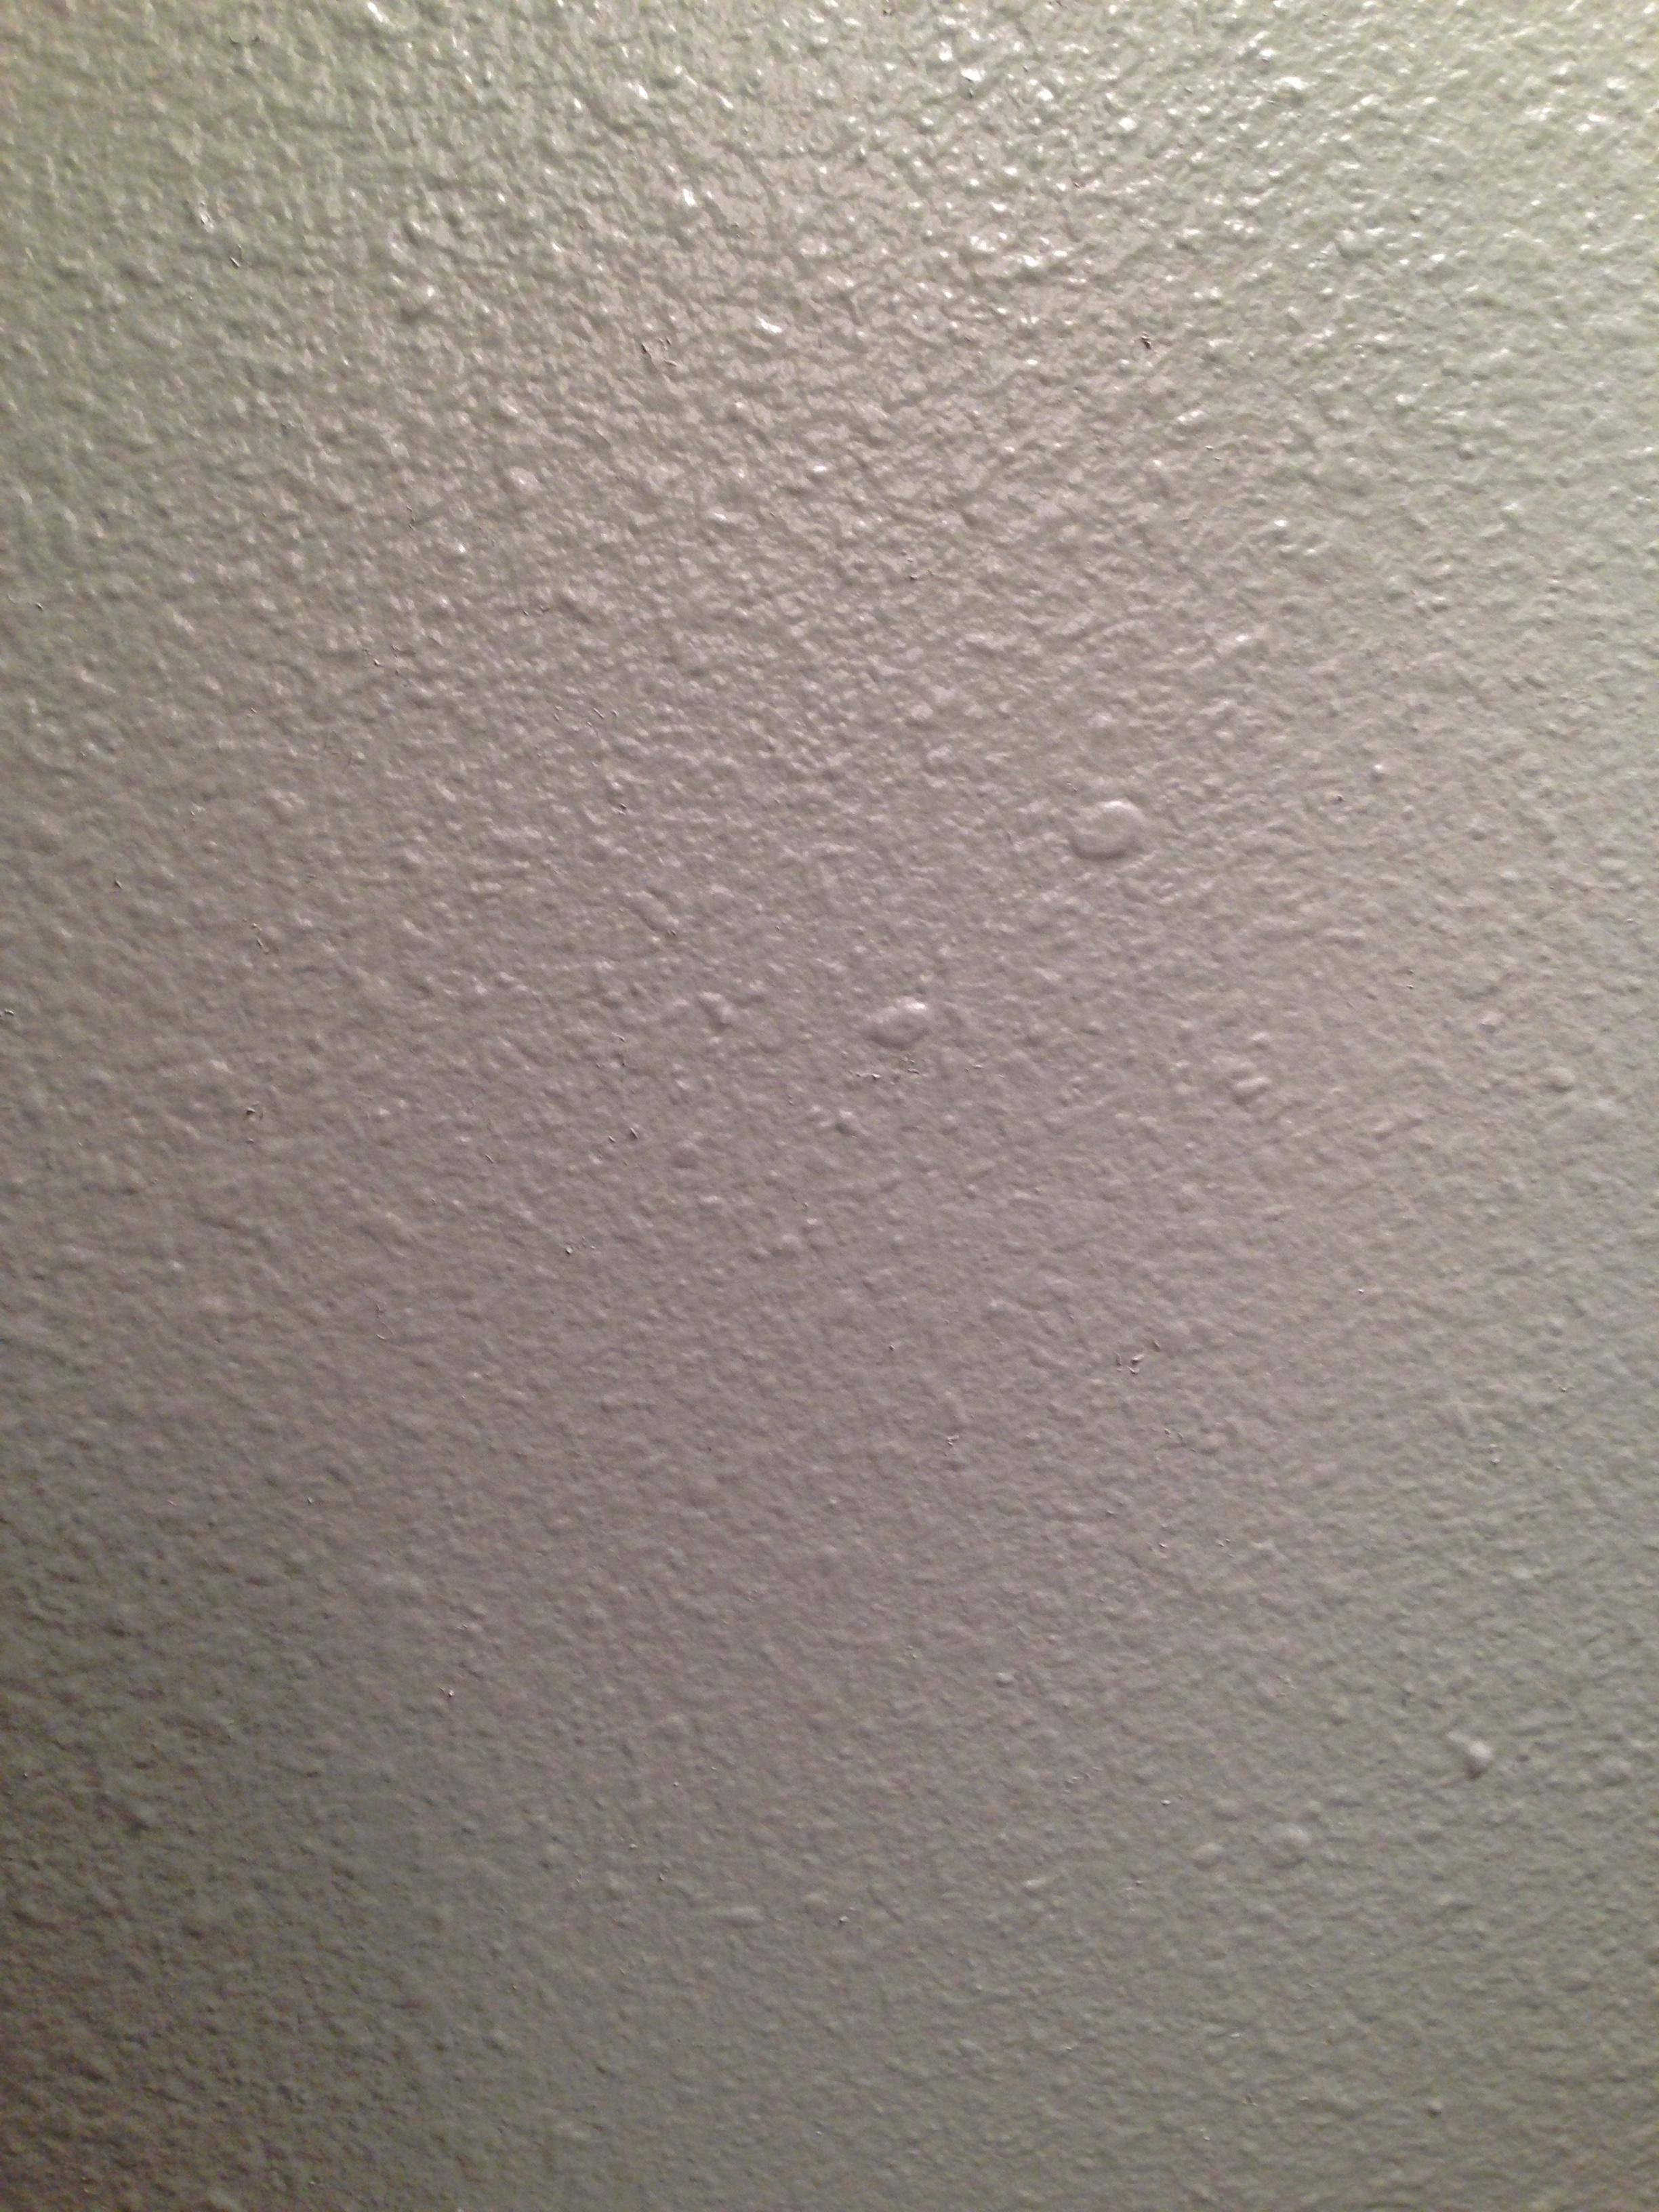 drywall help identifying type